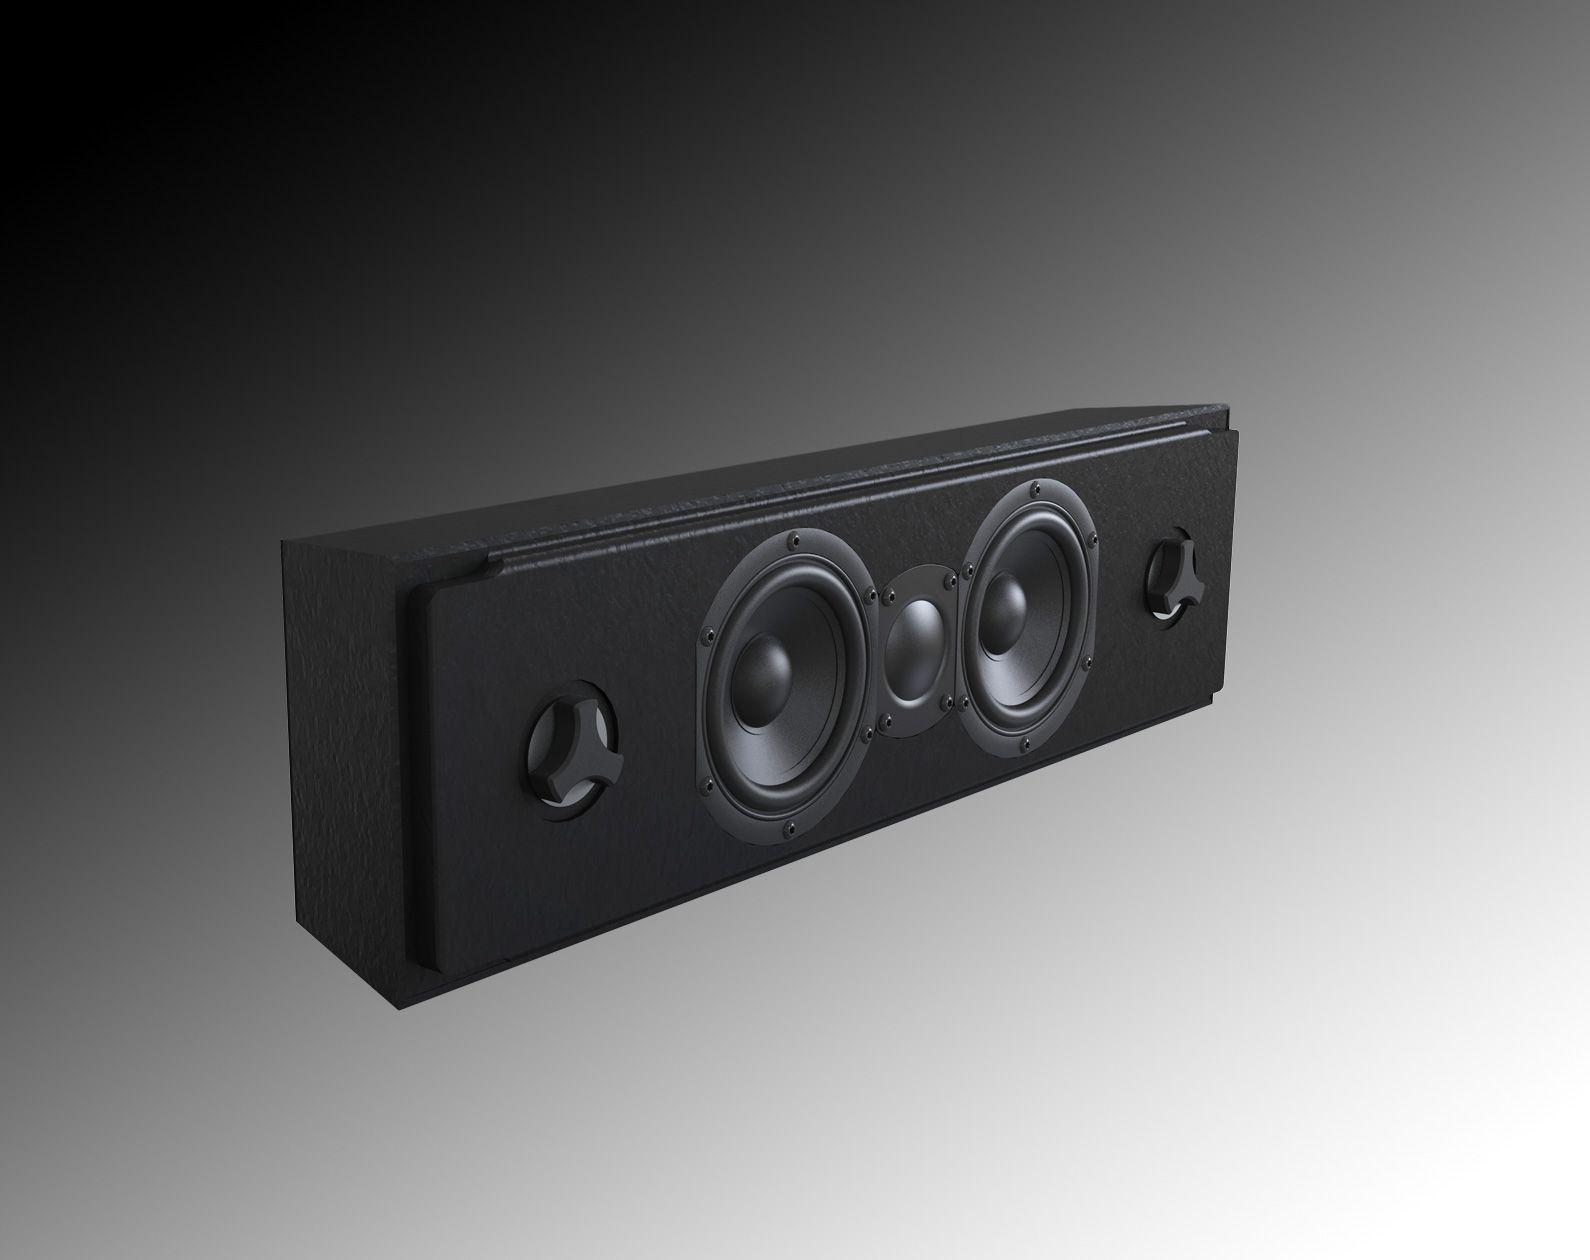 Triad speakers ONWALL MINI LCR 1.0 SE